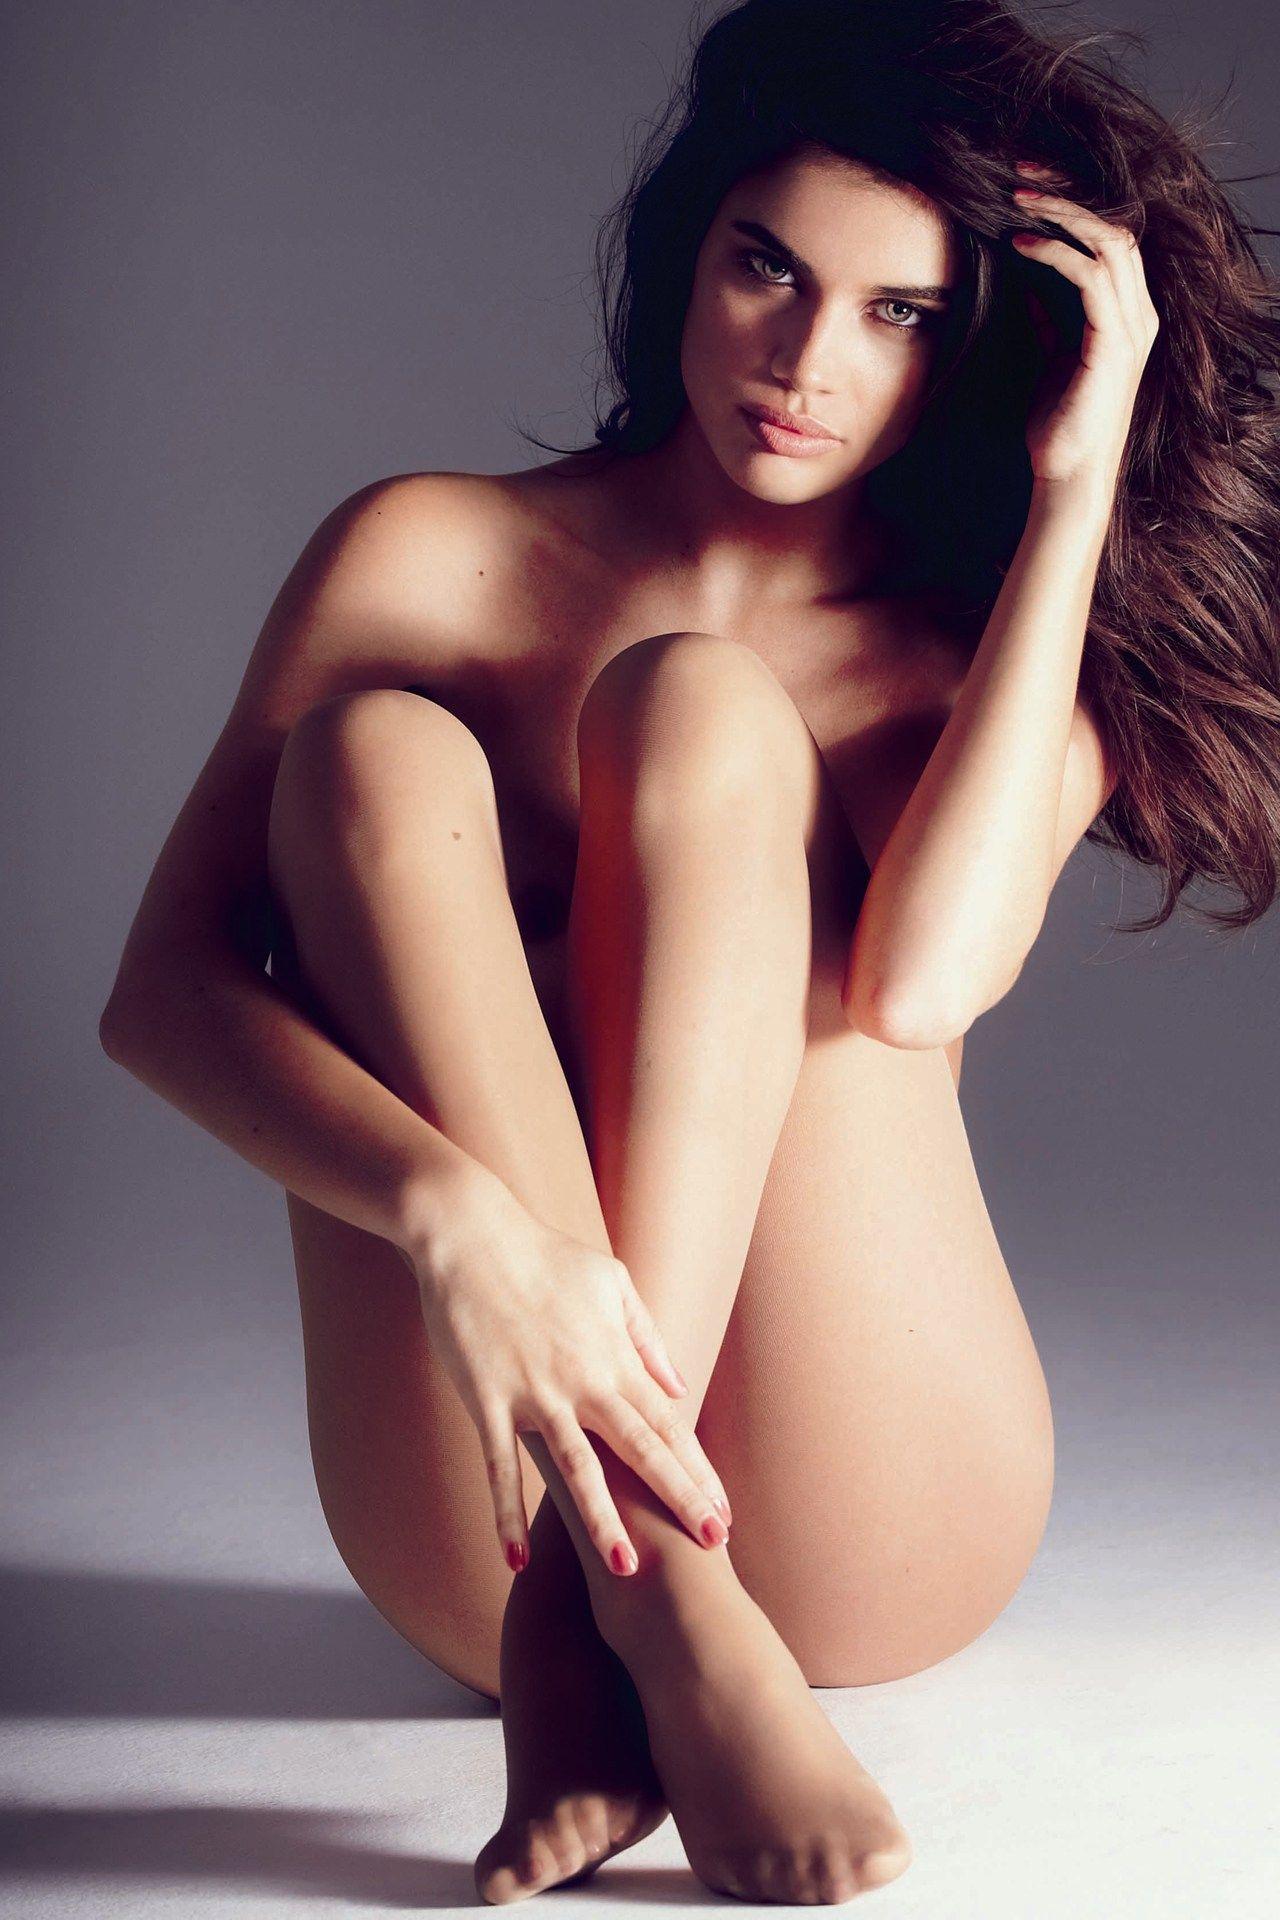 Sara Sampaio Sexy Fappening naked (43 photo), Sexy Celebrites photo